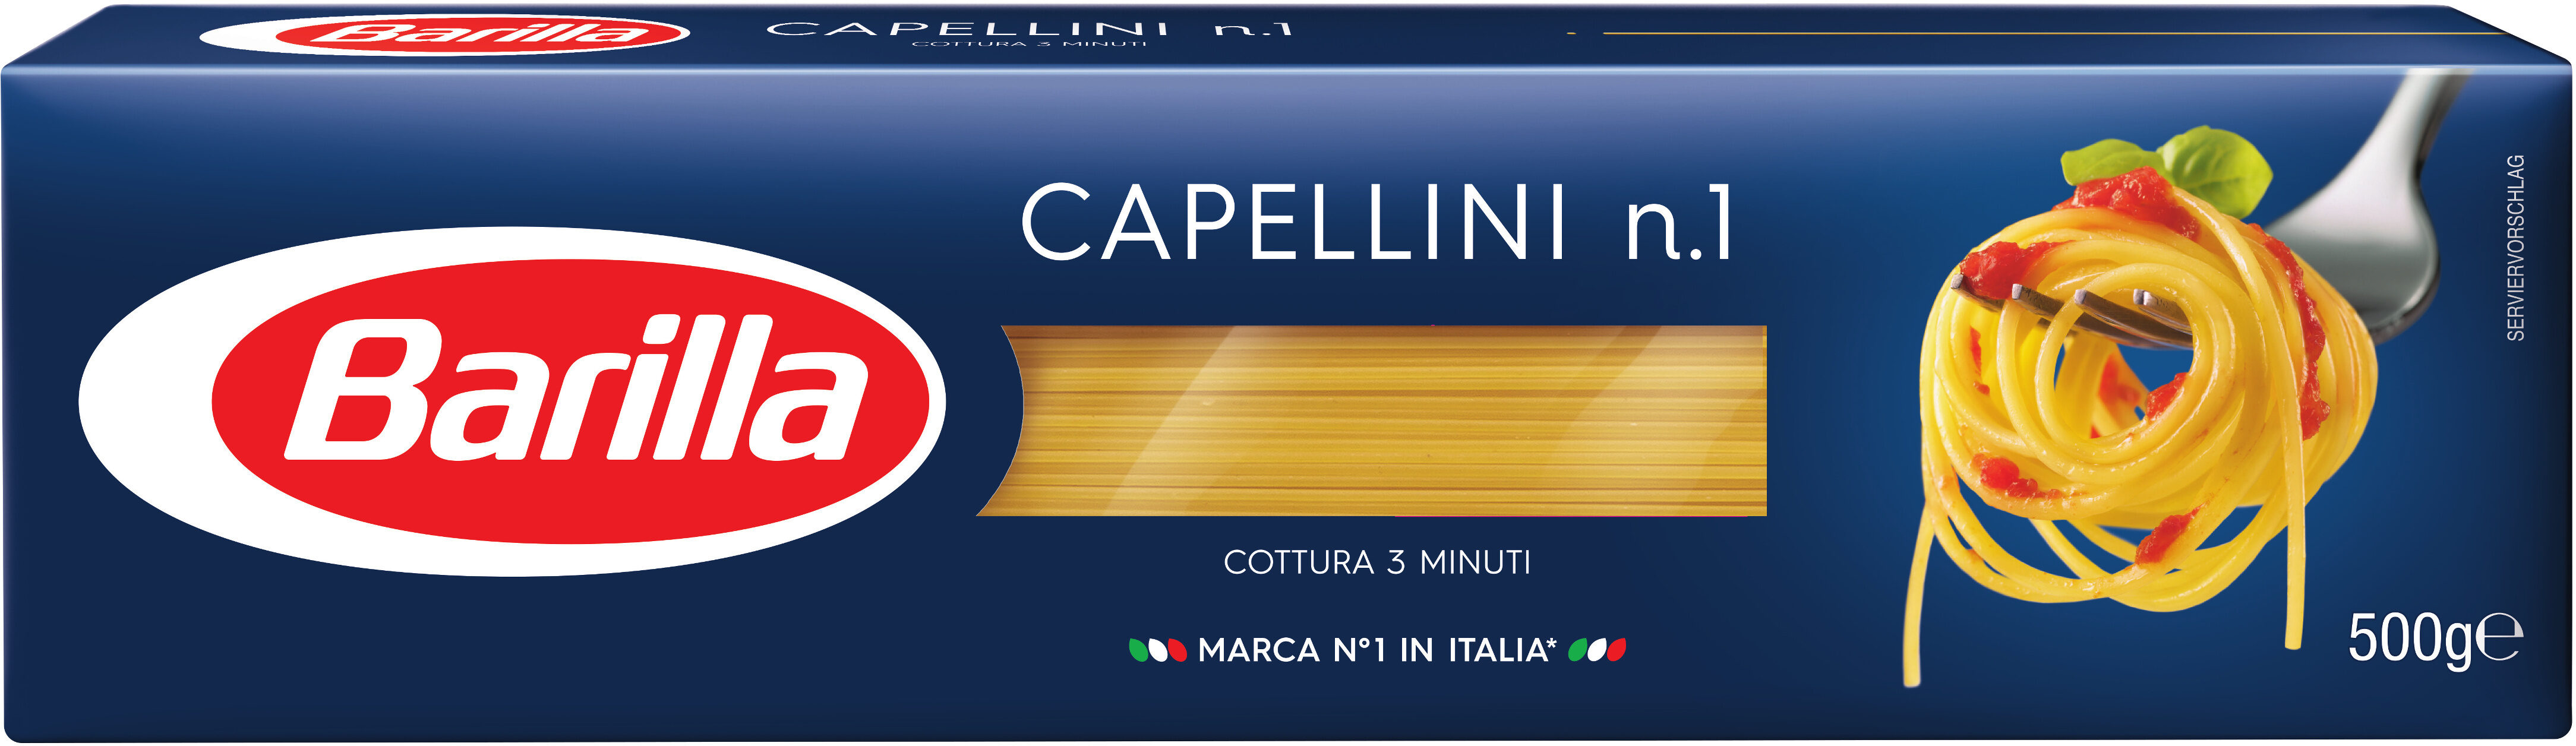 Pâtes Capellini - Product - fr